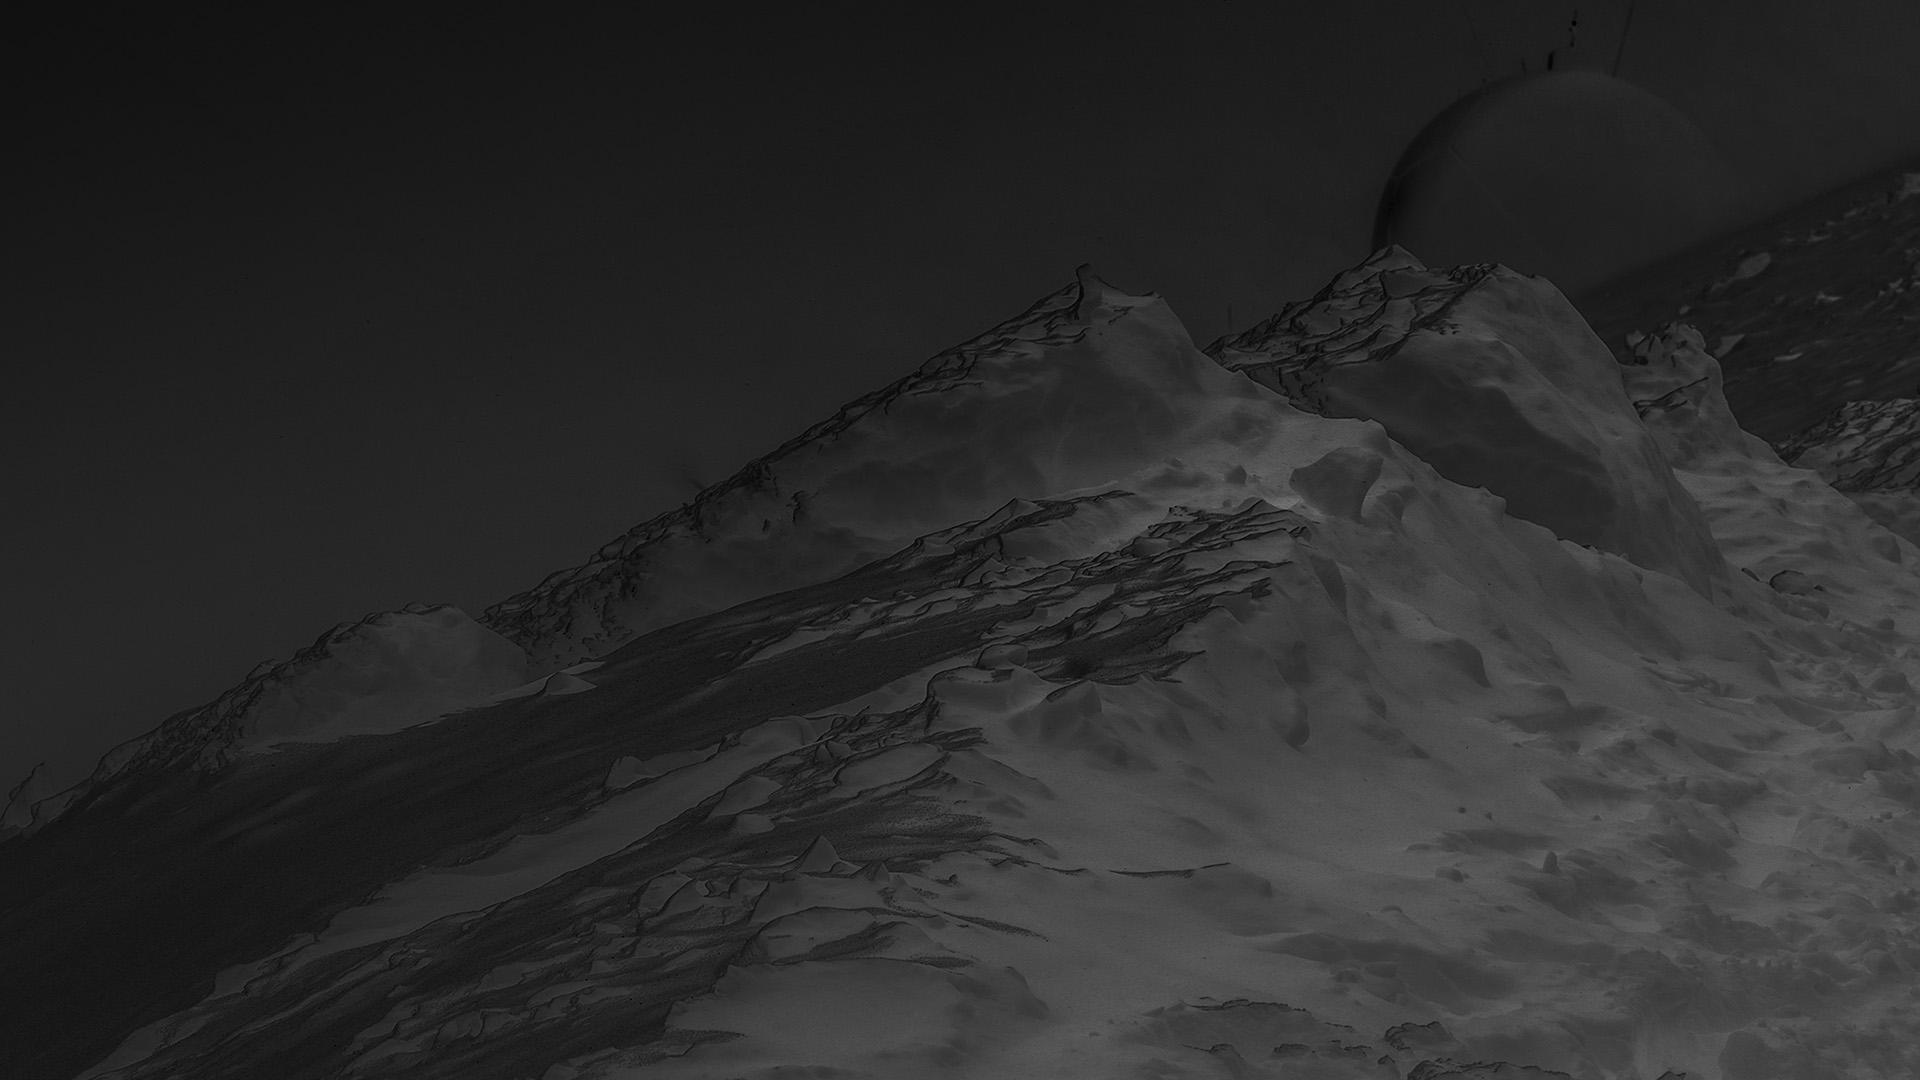 Wallpaper For Desktop Laptop Bb30 Dark Mountain Bubble Minimal